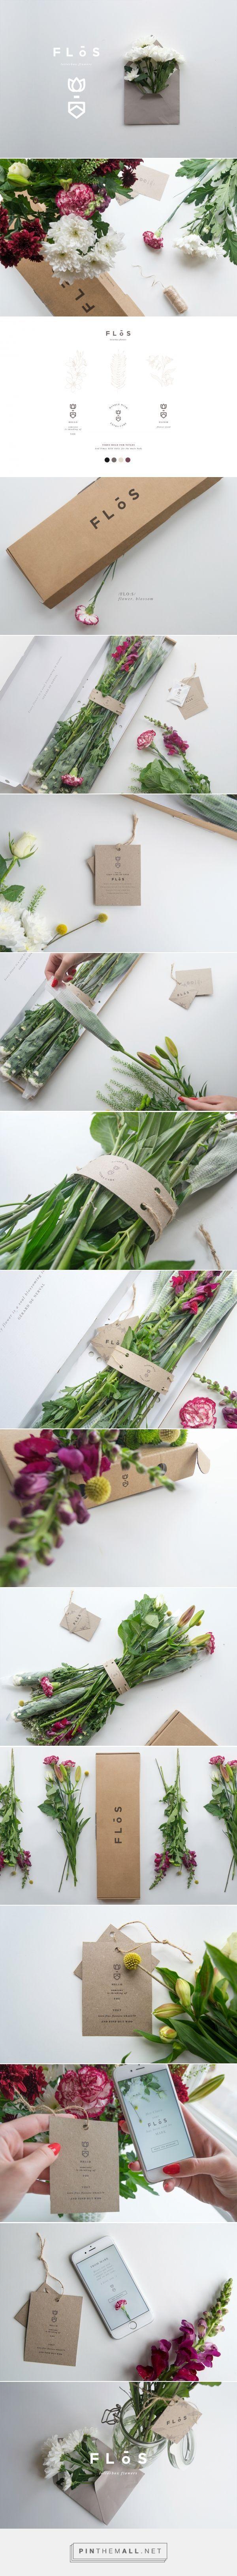 Flōs - Letterbox Flowers Logo Design & Packaging by Giadaland…